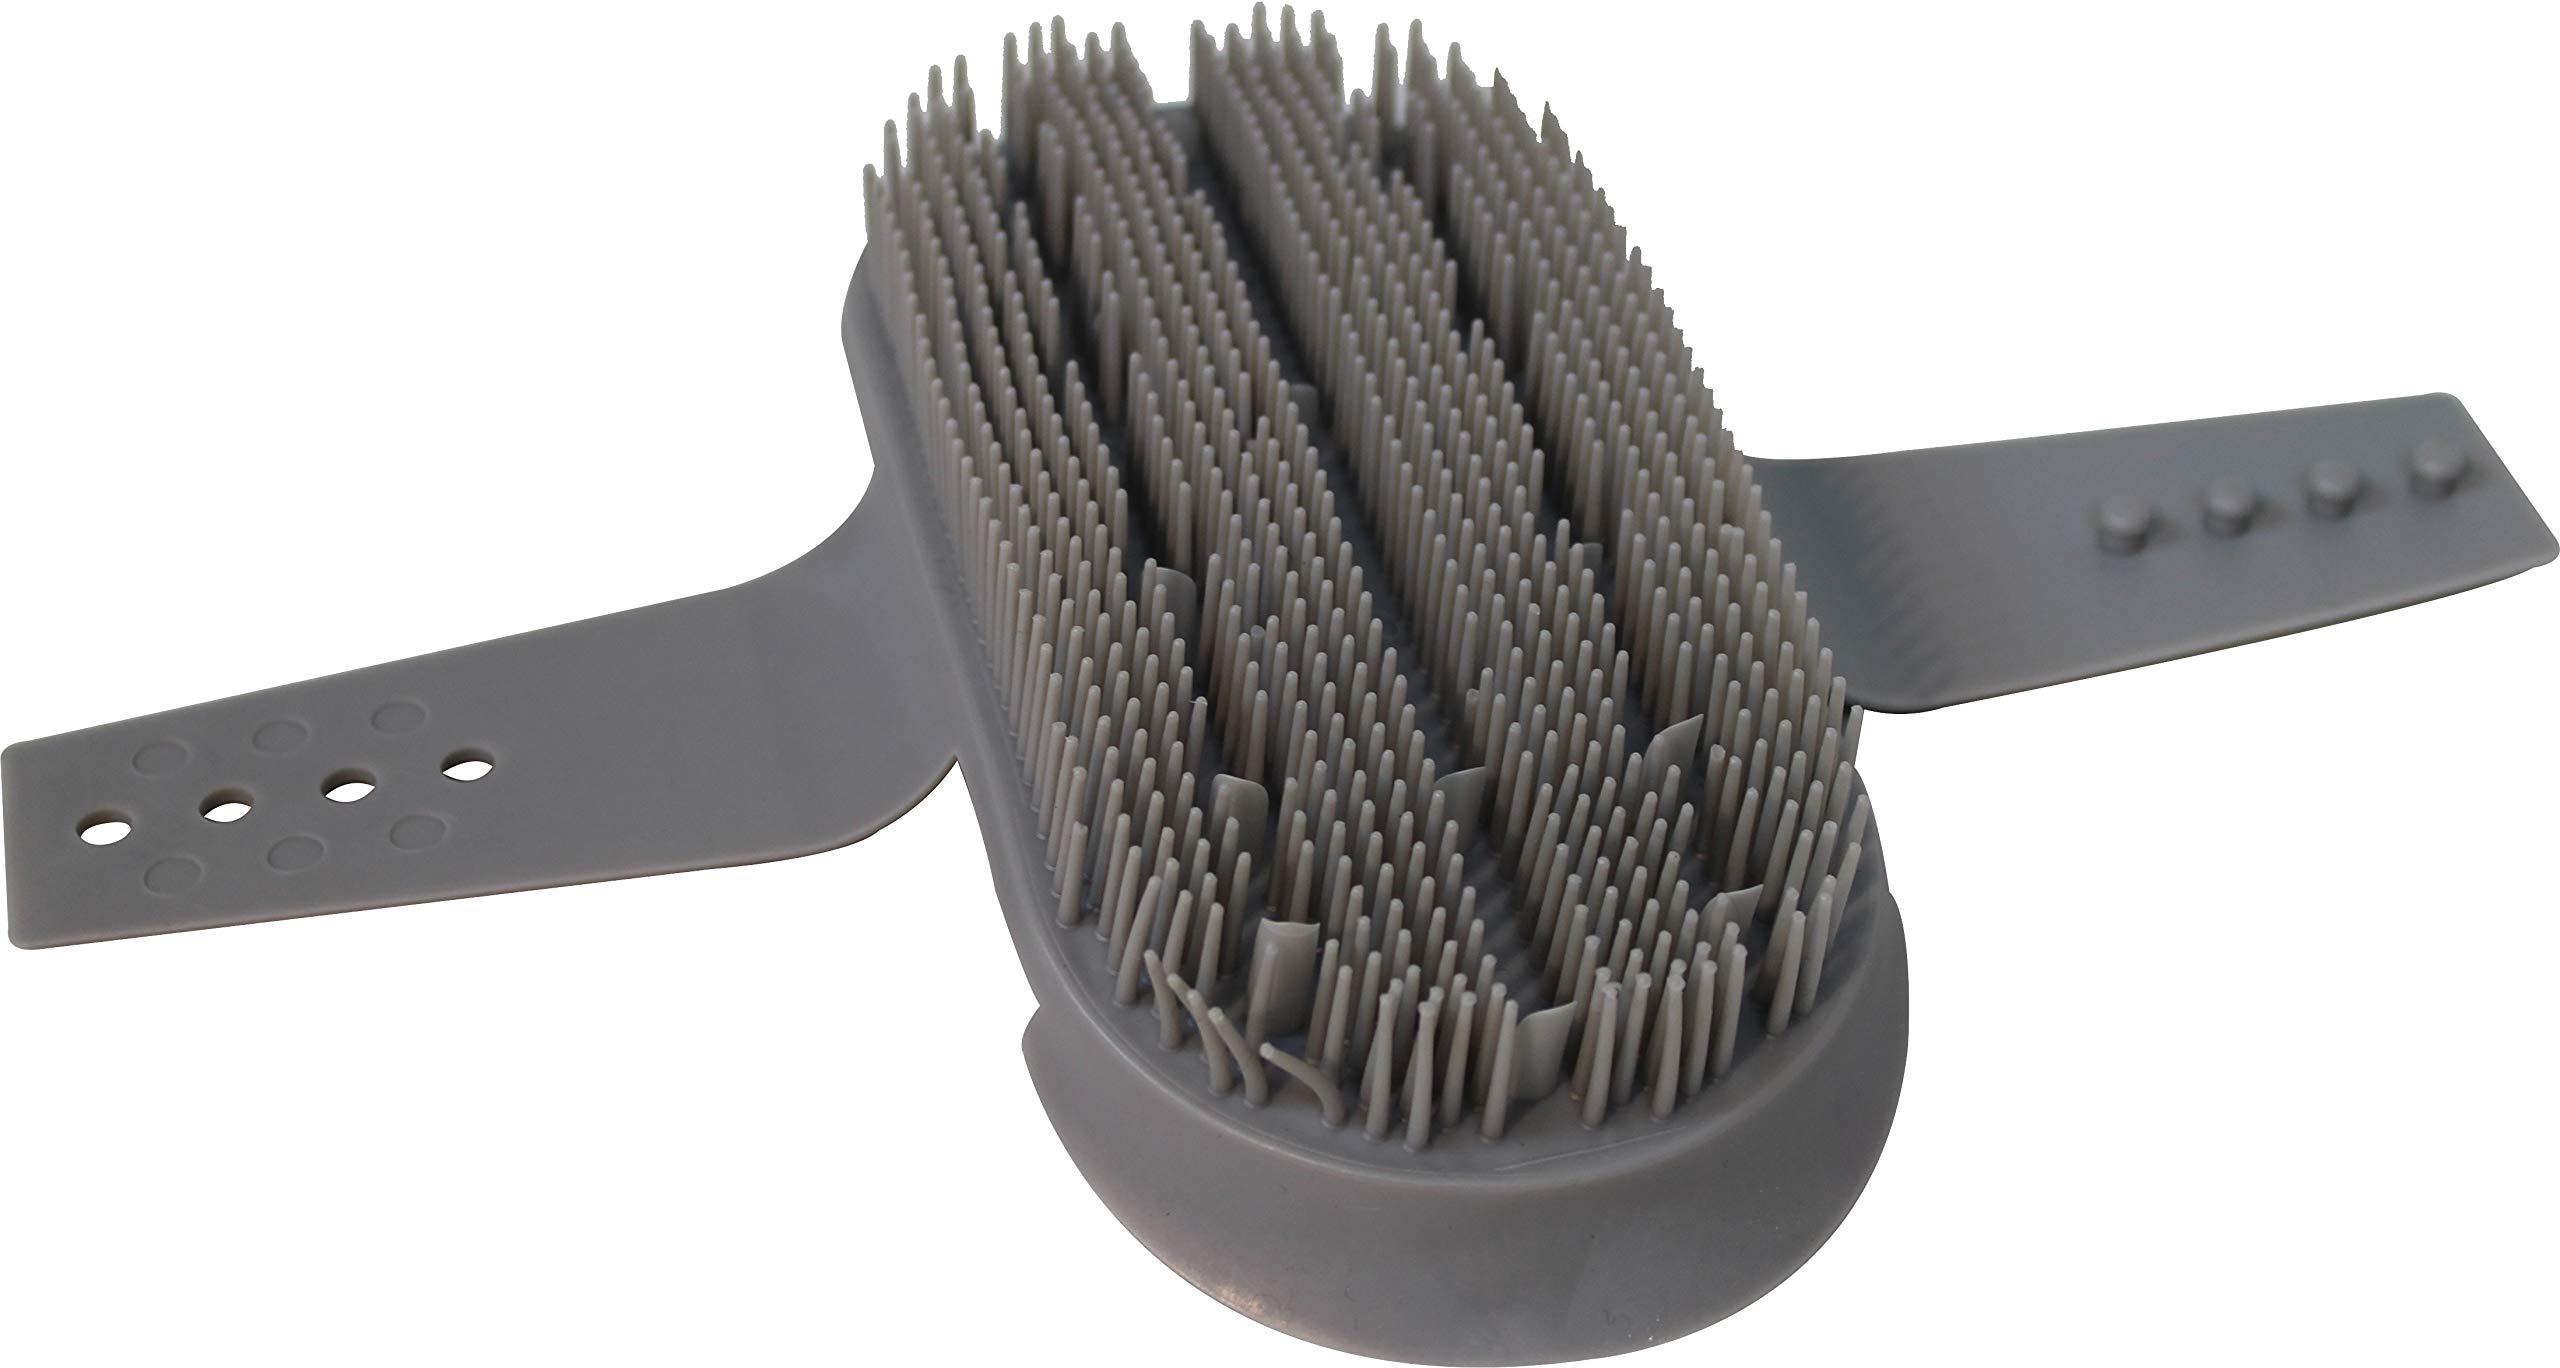 KBF99 Curry Comb - Grey